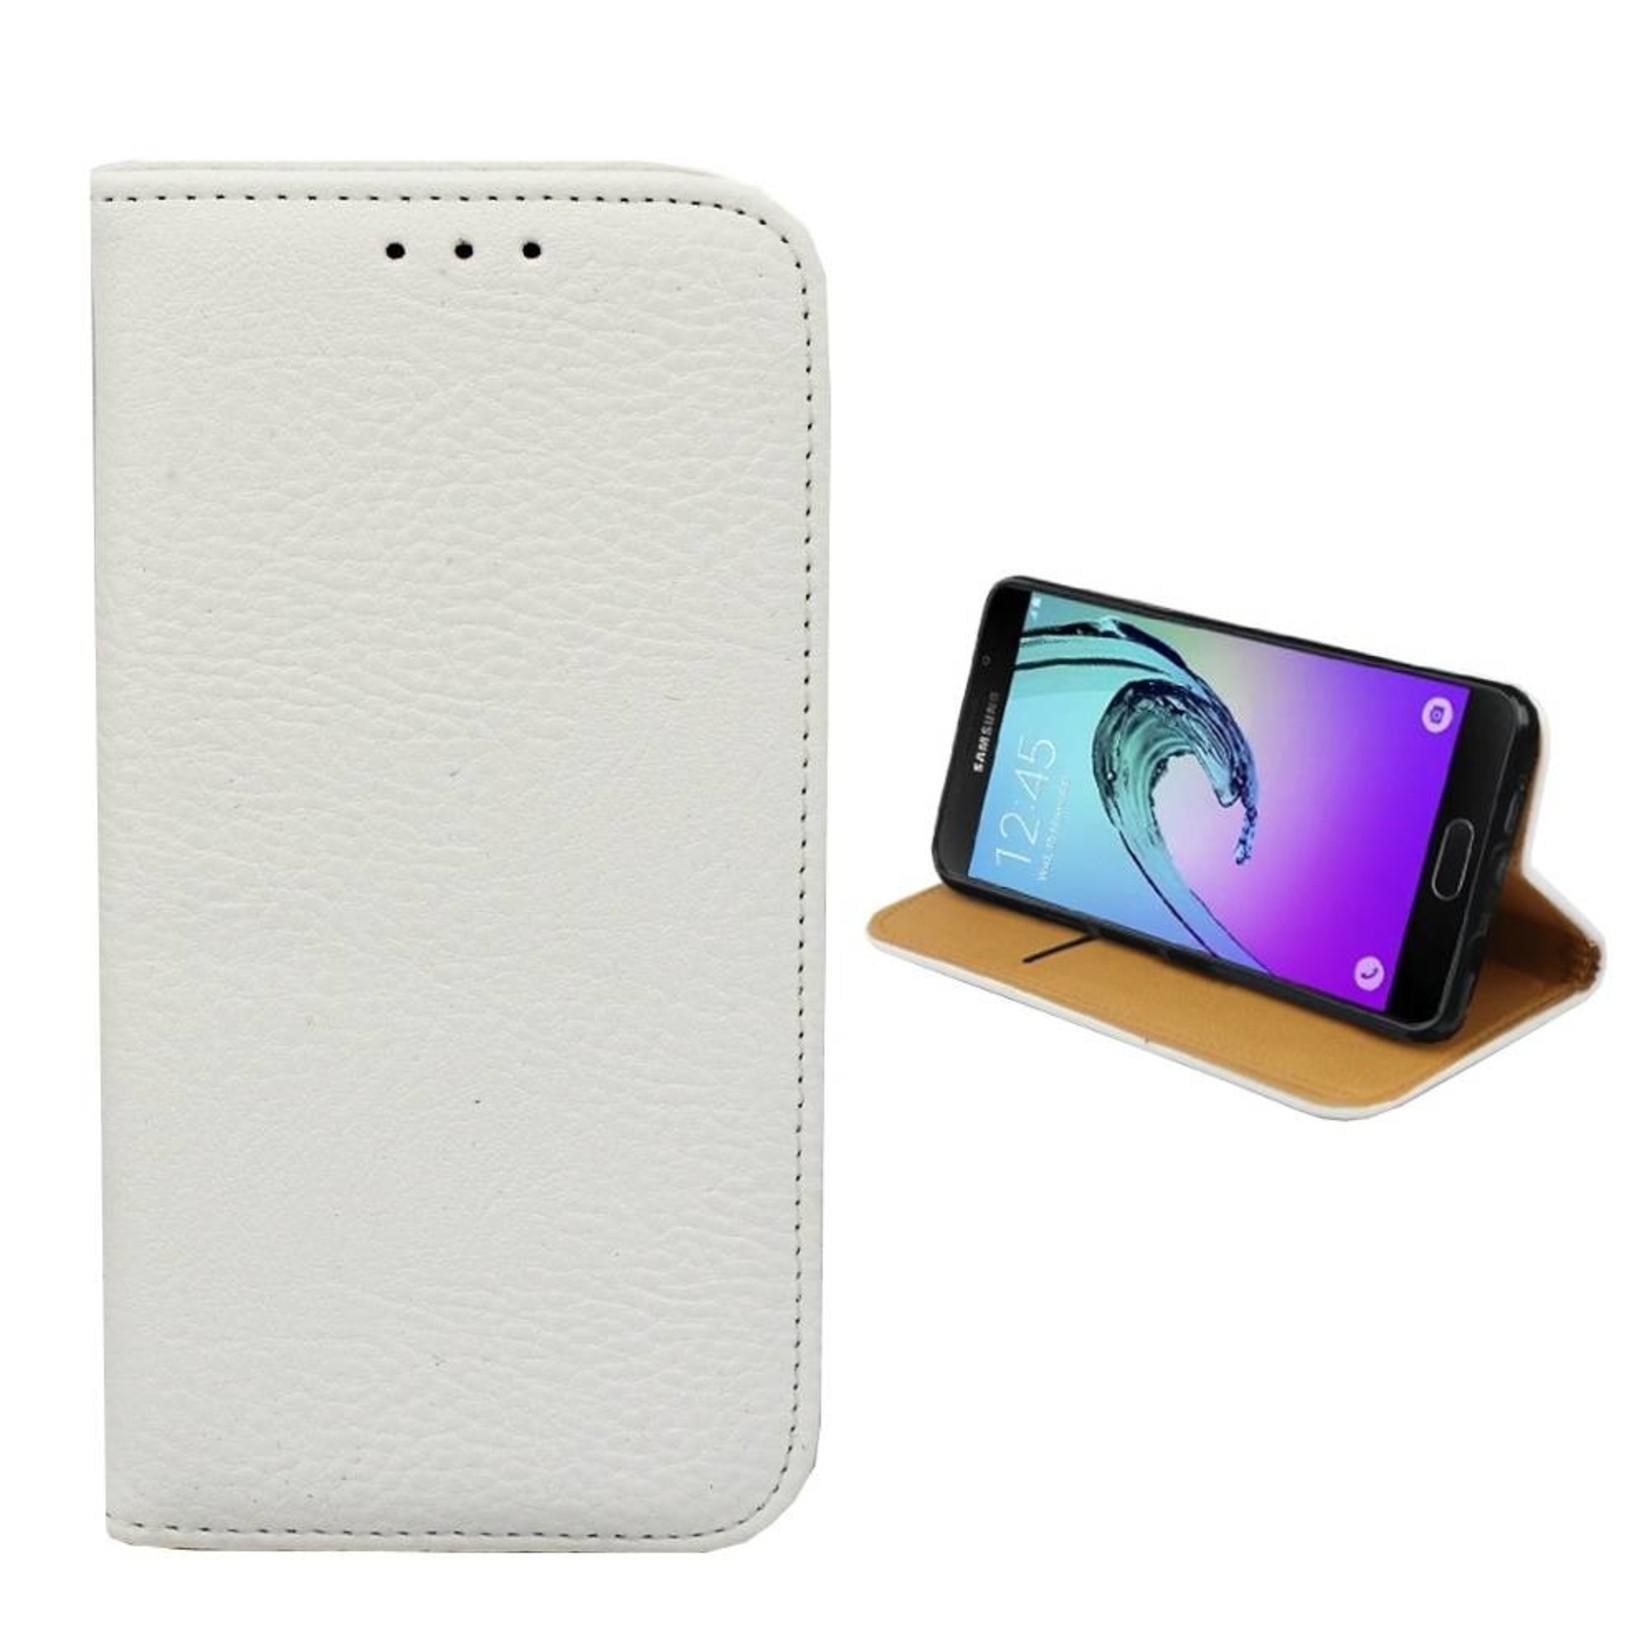 Colorfone Hoesje Book voor Samsung A3 2016 Wit